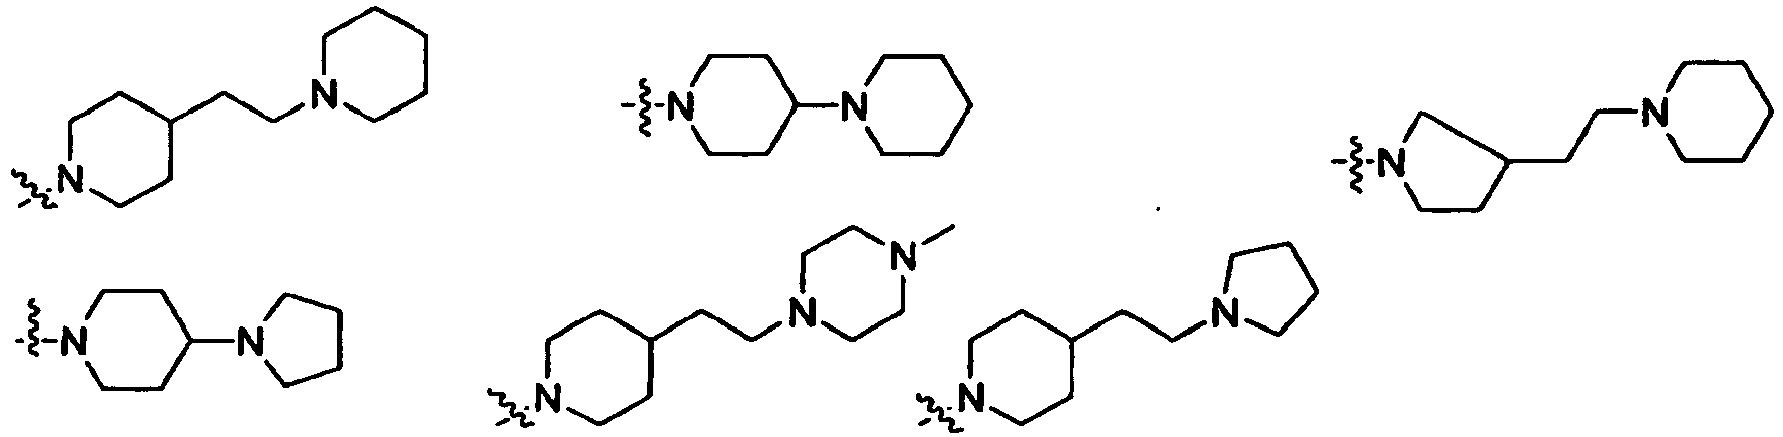 Ep2066659b1 Substituierte Sulfonamid Derivate Google Patents